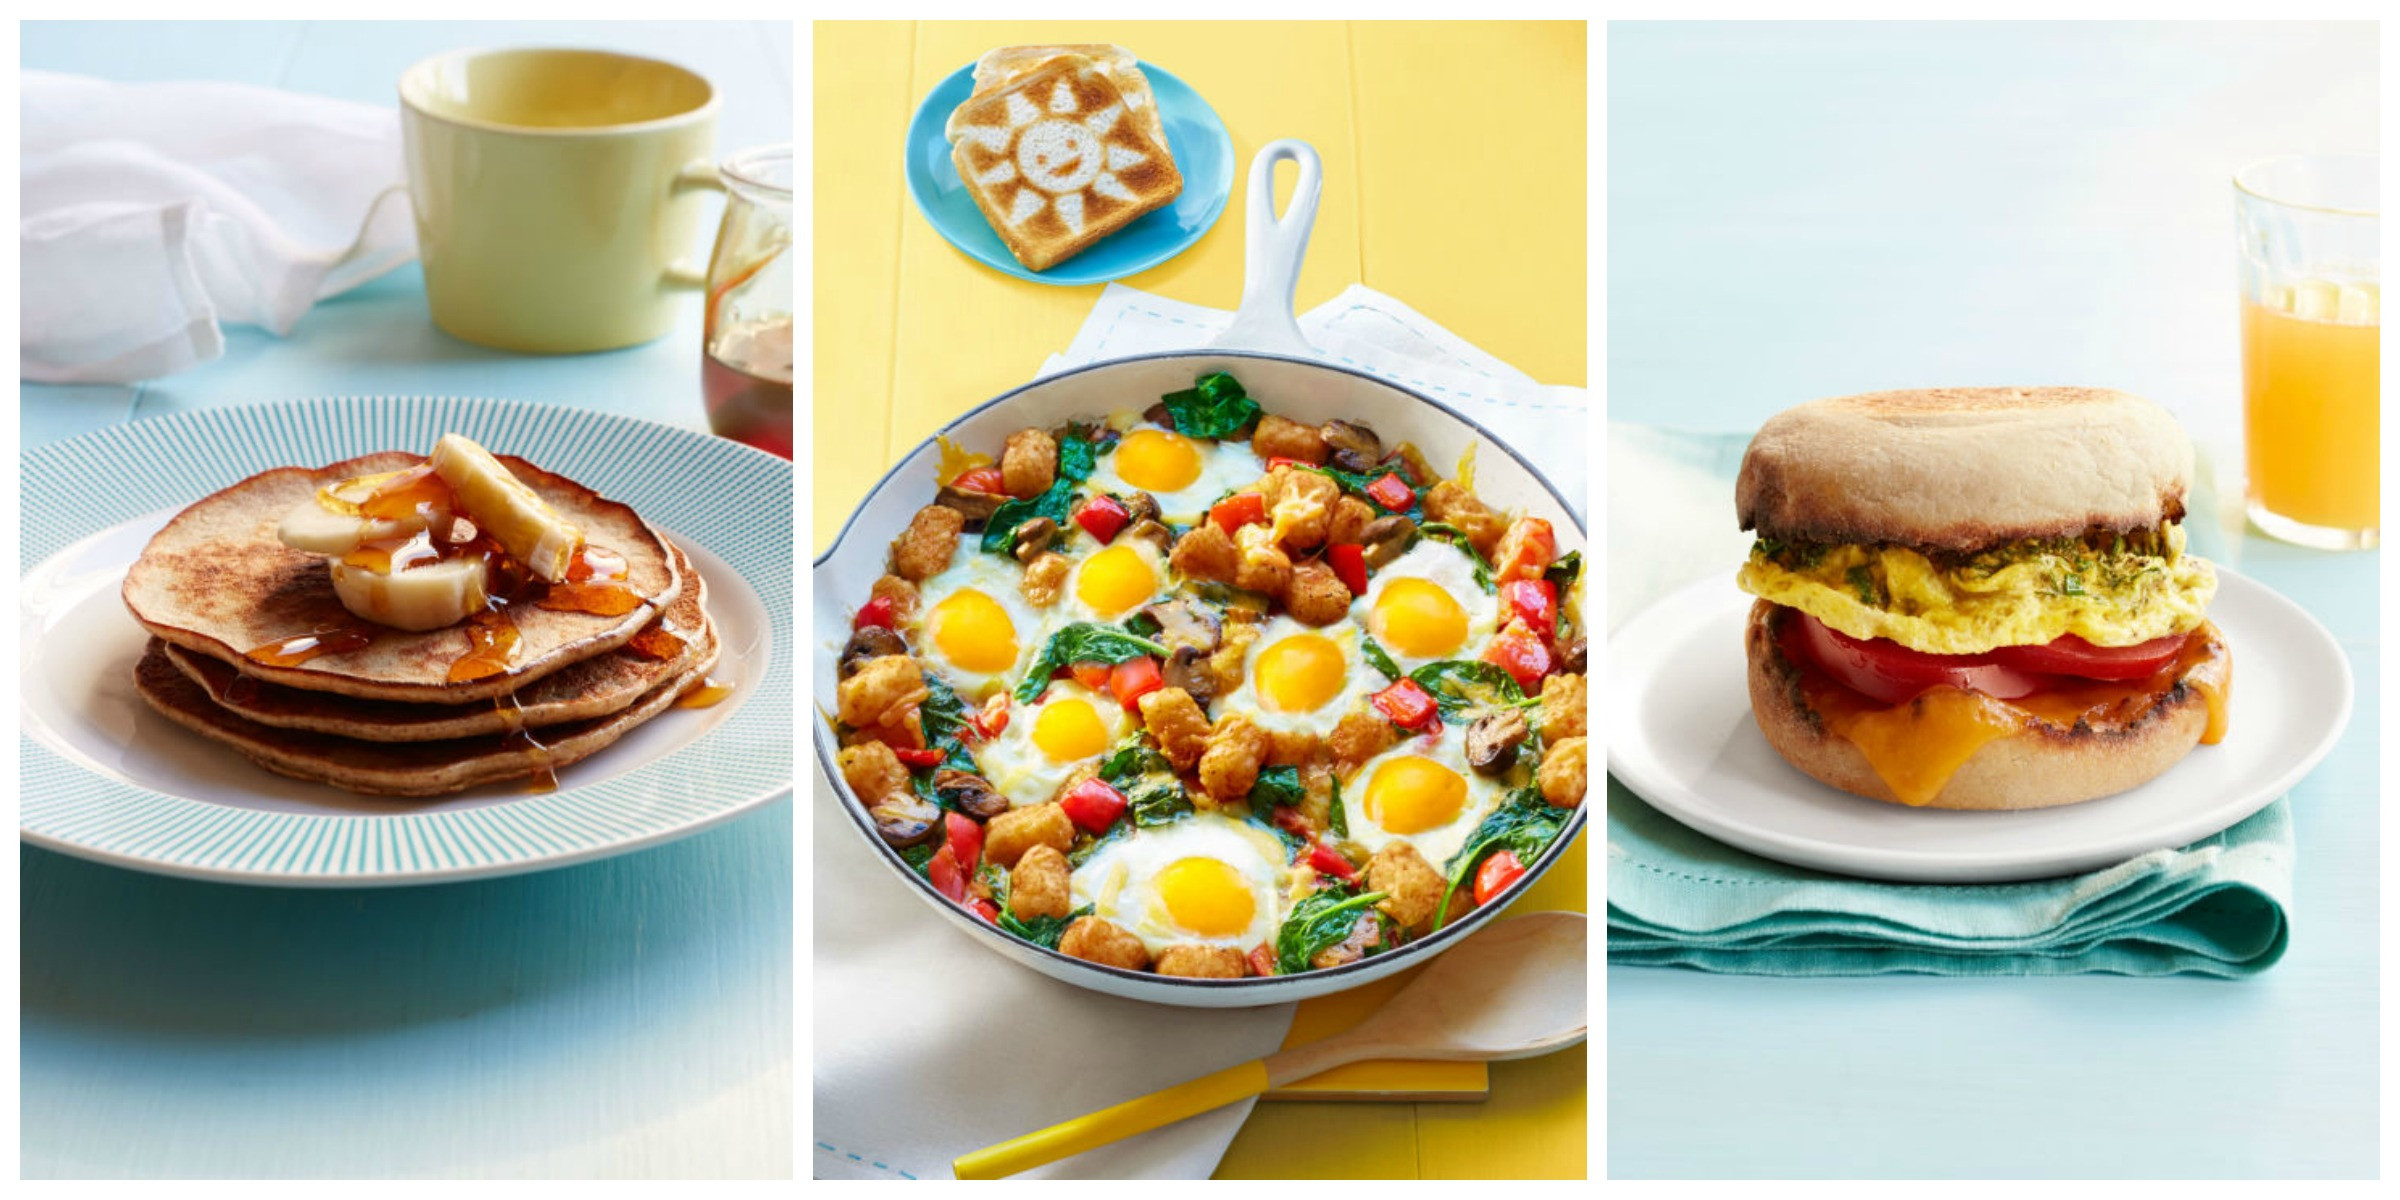 Healthy Breakfast For Toddlers  49 Easy Kid Friendly Breakfast Recipes Quick Breakfast